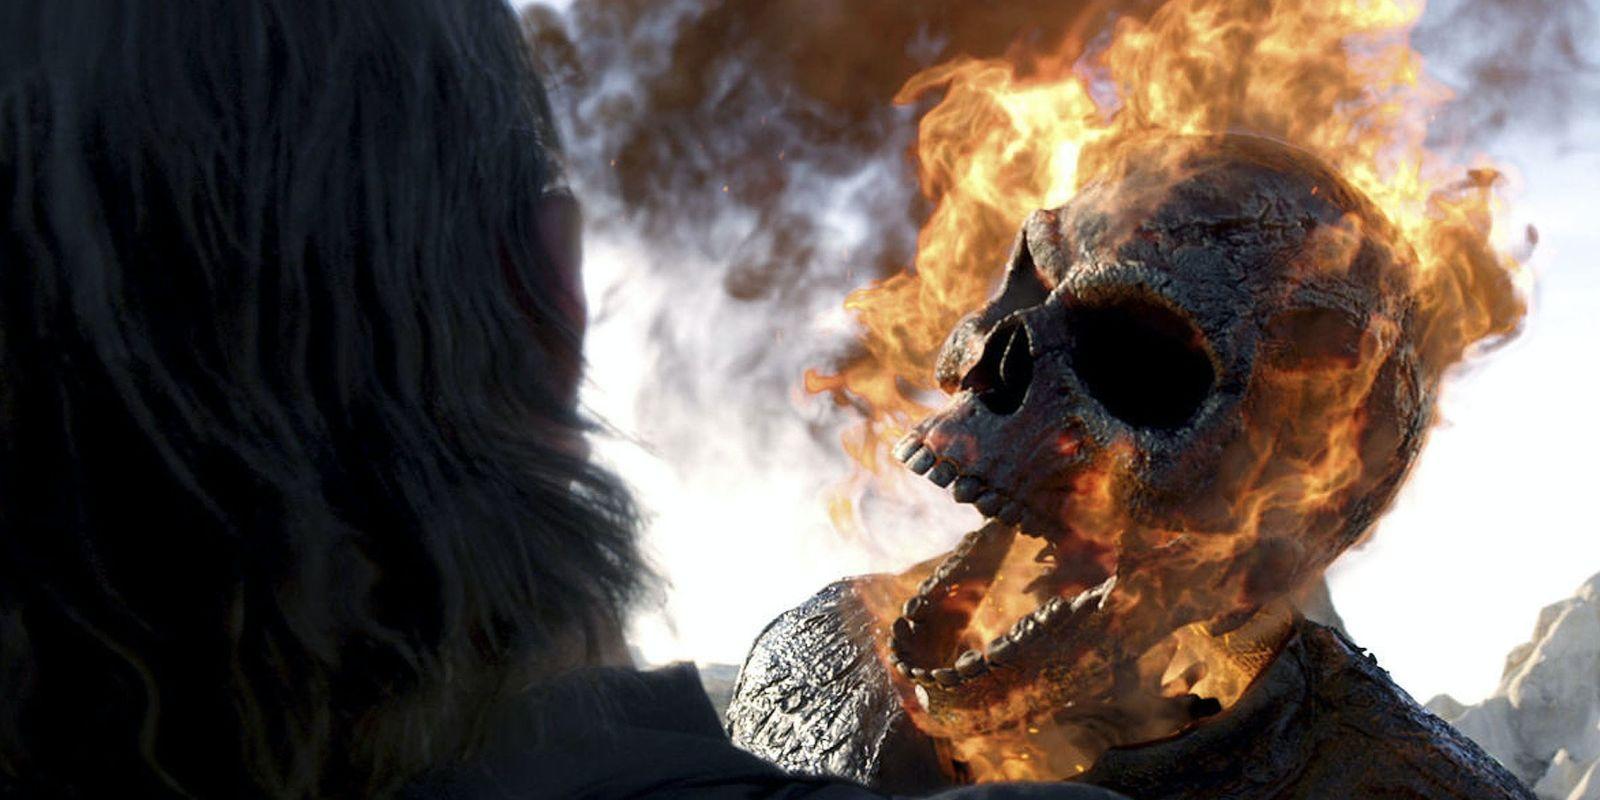 Dantania: Ghost Rider Spirit Of Vengeance Review |Ghost Rider Bad Guy Look